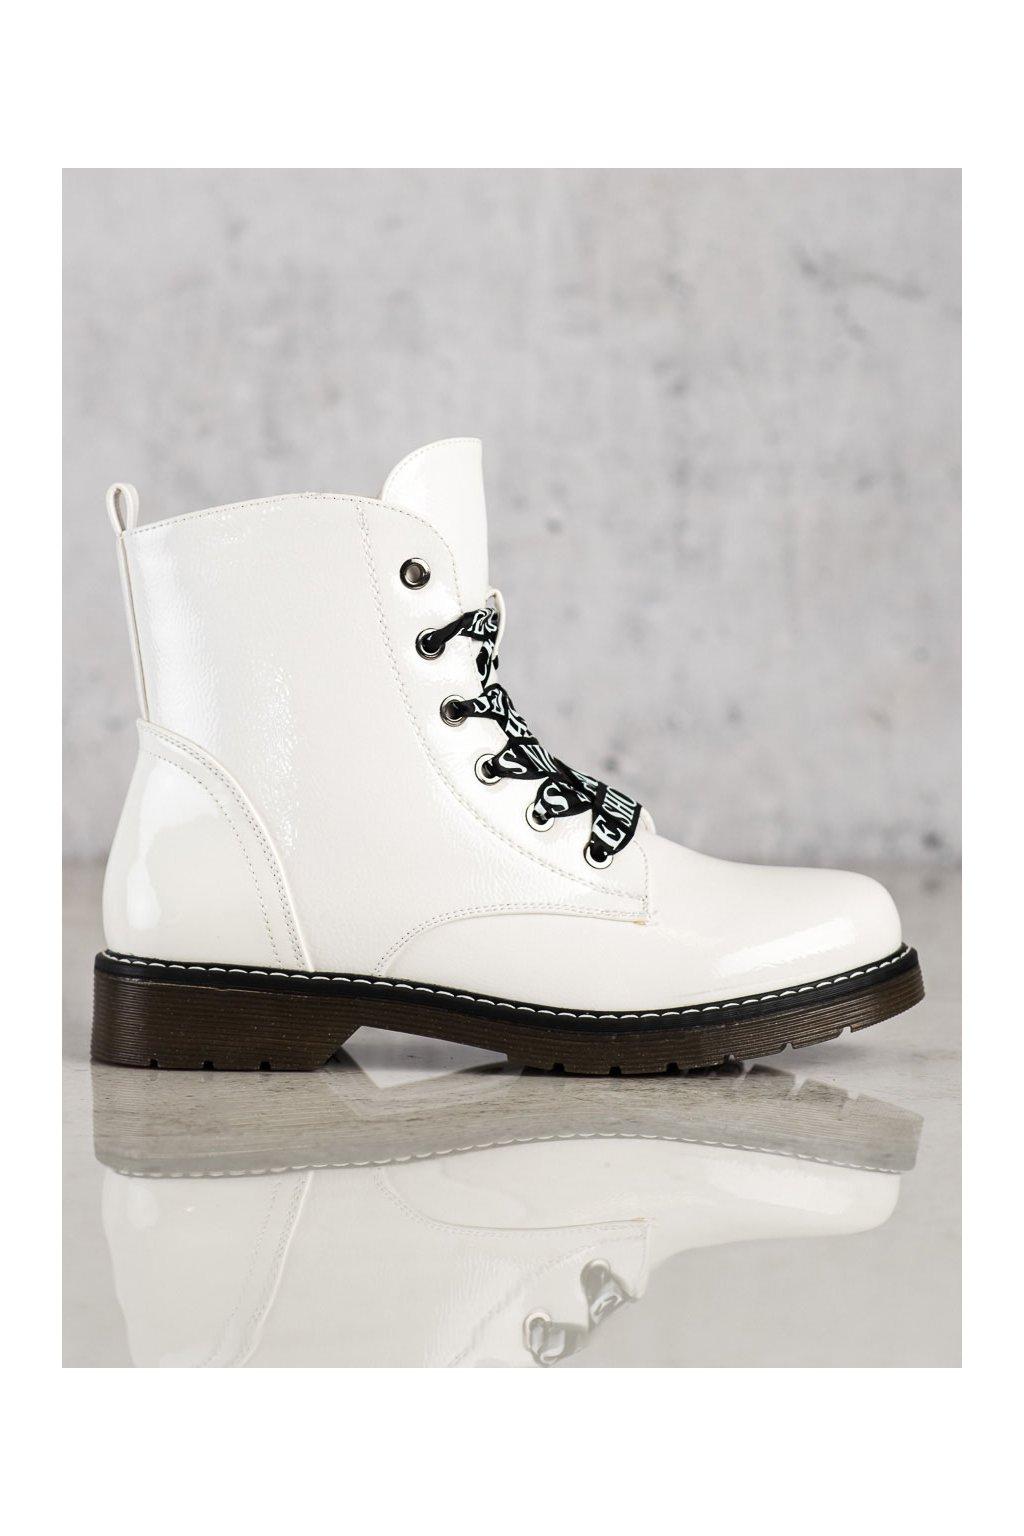 Biele dámske topánky Vinceza kod HX22-16253W